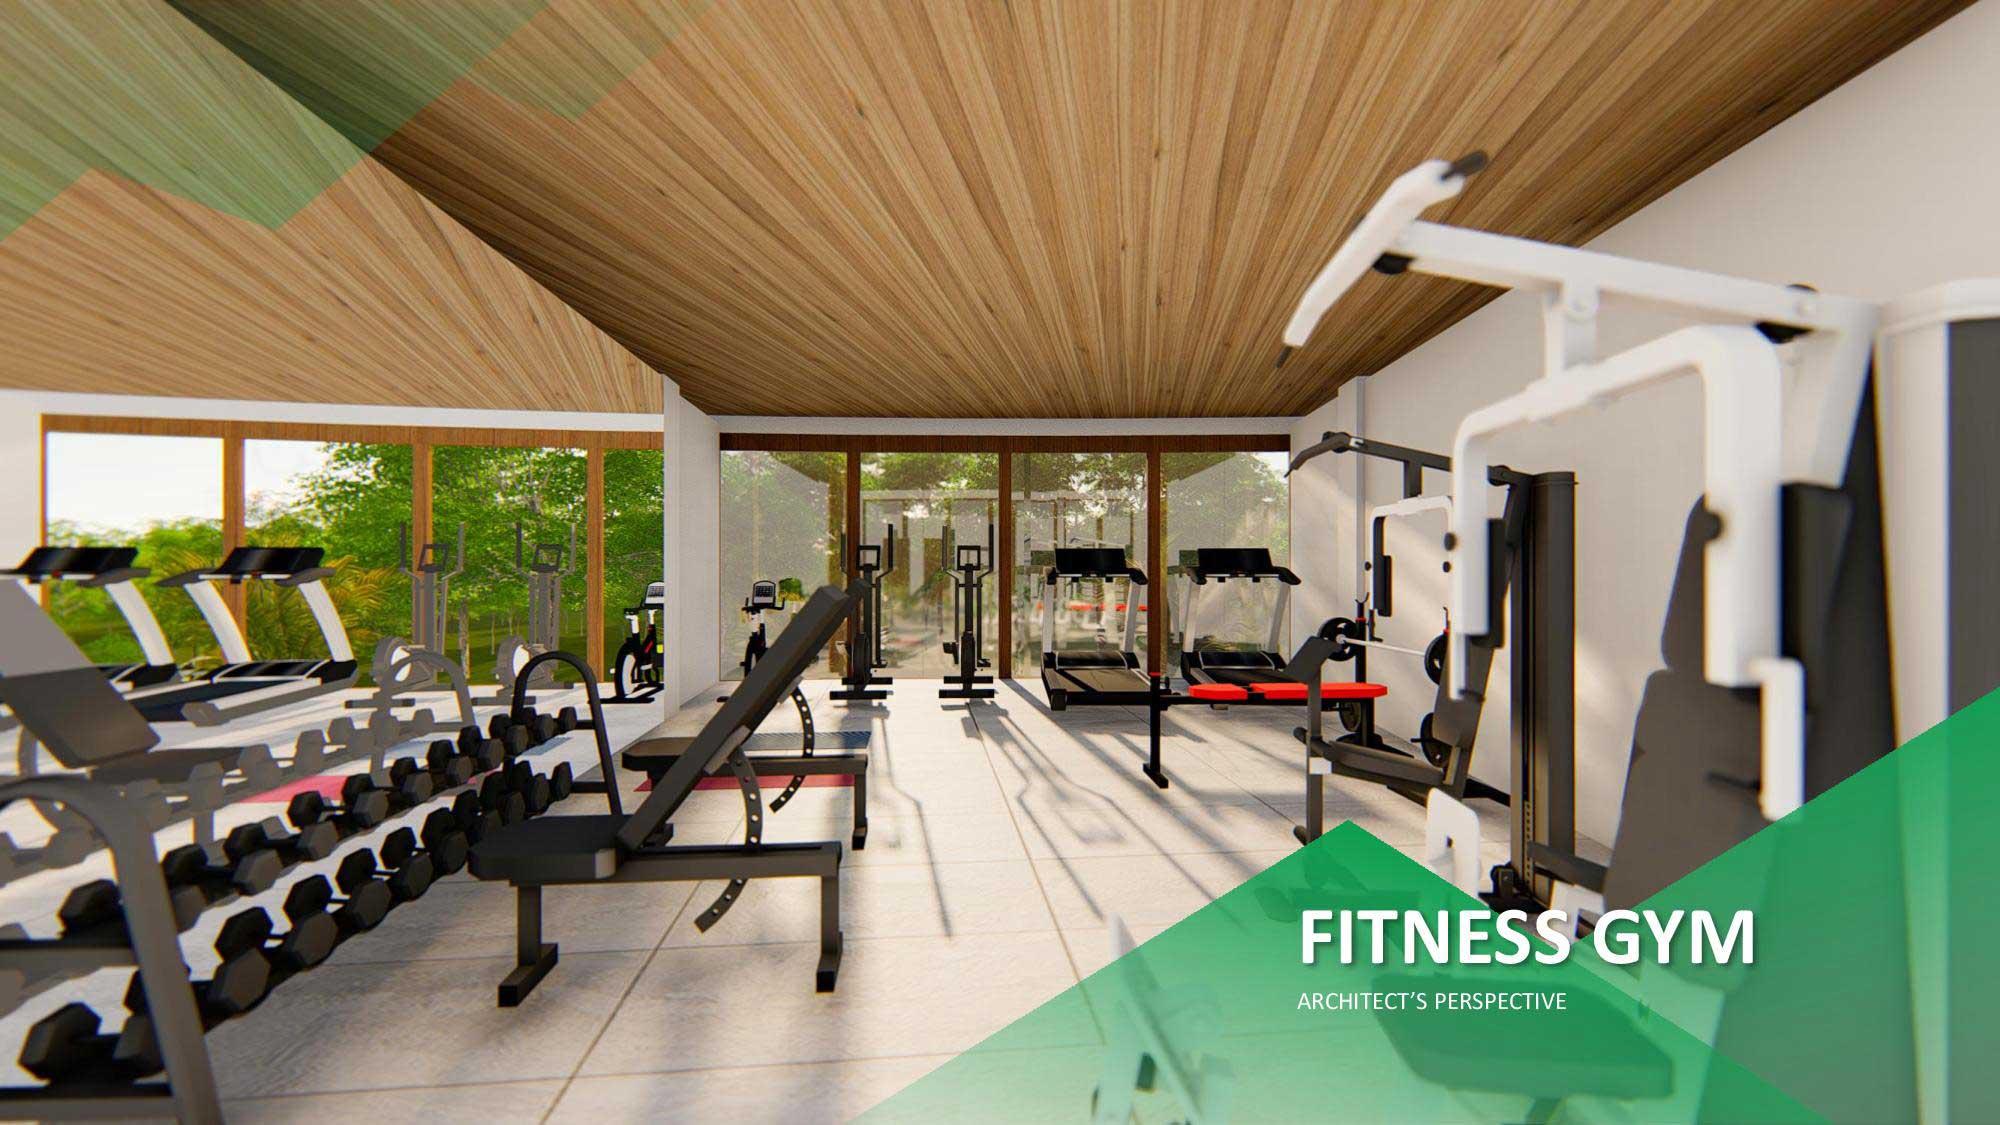 Velmiro heights agusan fitness gym web gmc